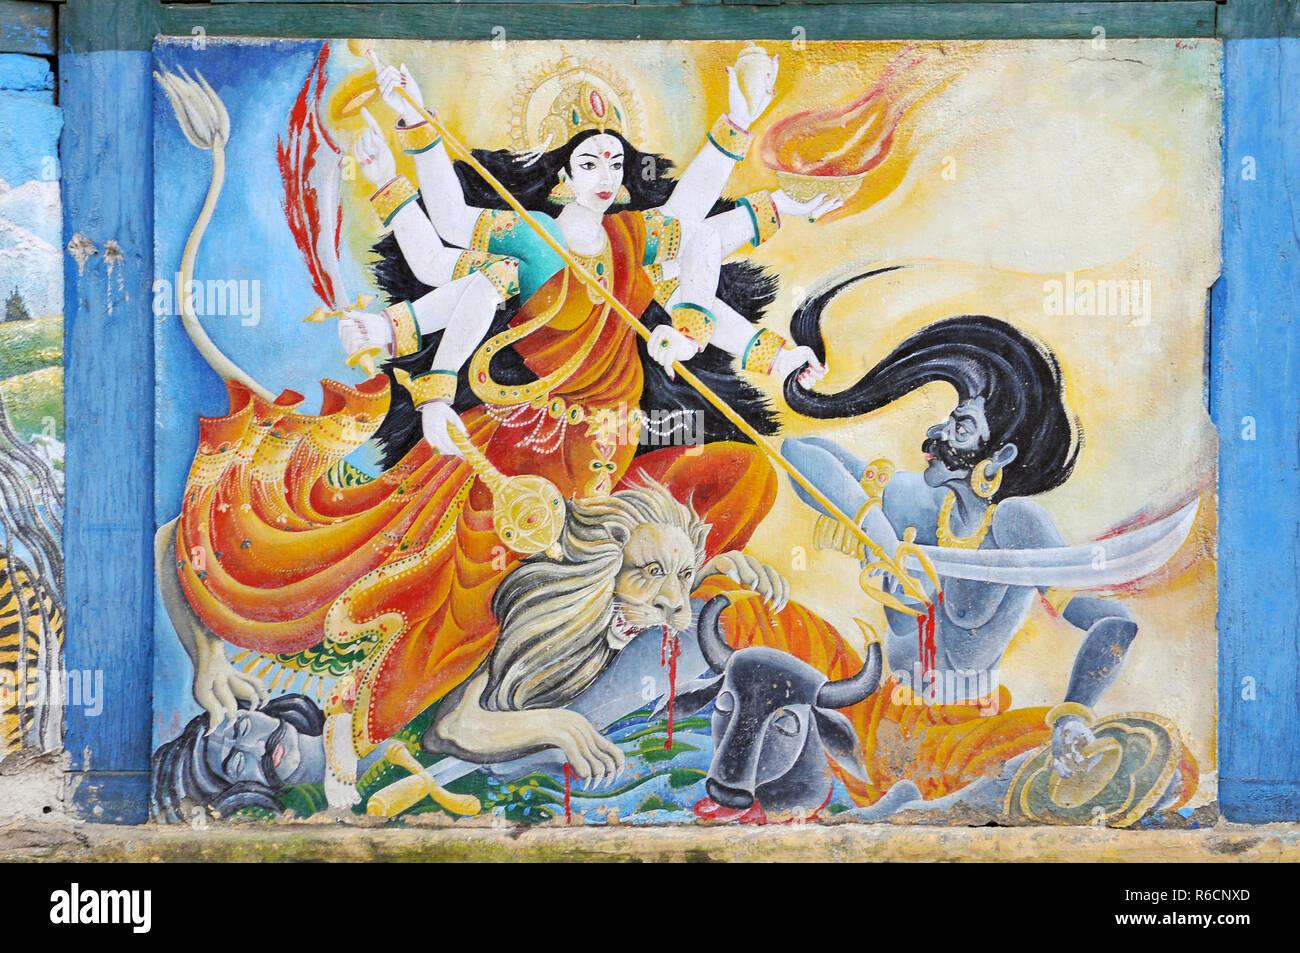 Nepal, Kathmandu, A Painting Of The Hindu Goddess Durga Adorns The Walls Of A Temple At Kathmandu'S Pashupatinath - Stock Image